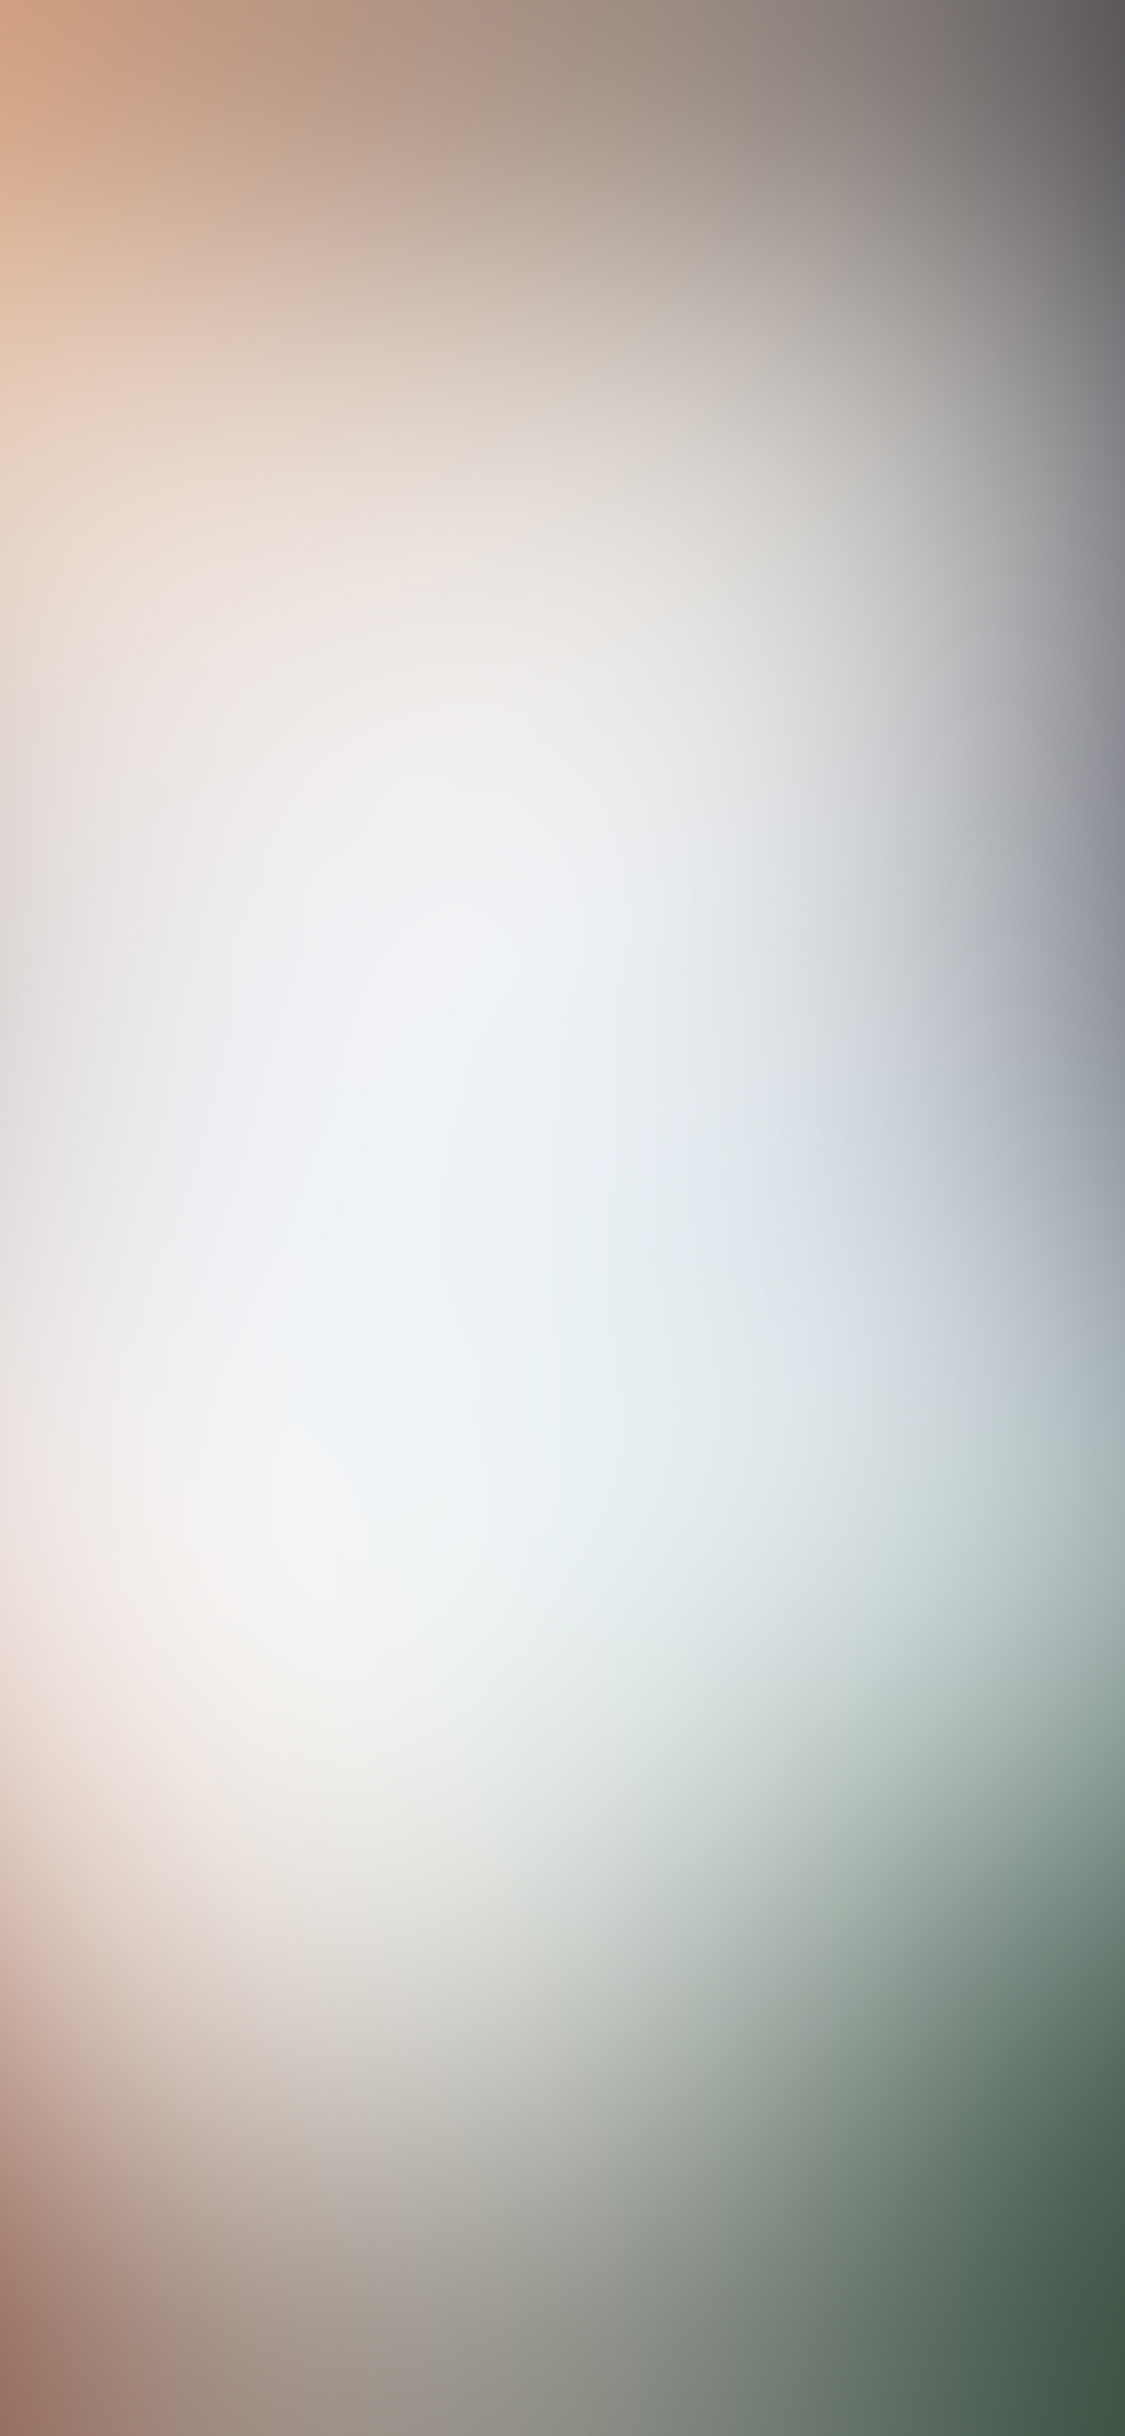 iPhoneXpapers.com-Apple-iPhone-wallpaper-sd71-work-hard-gradation-blur